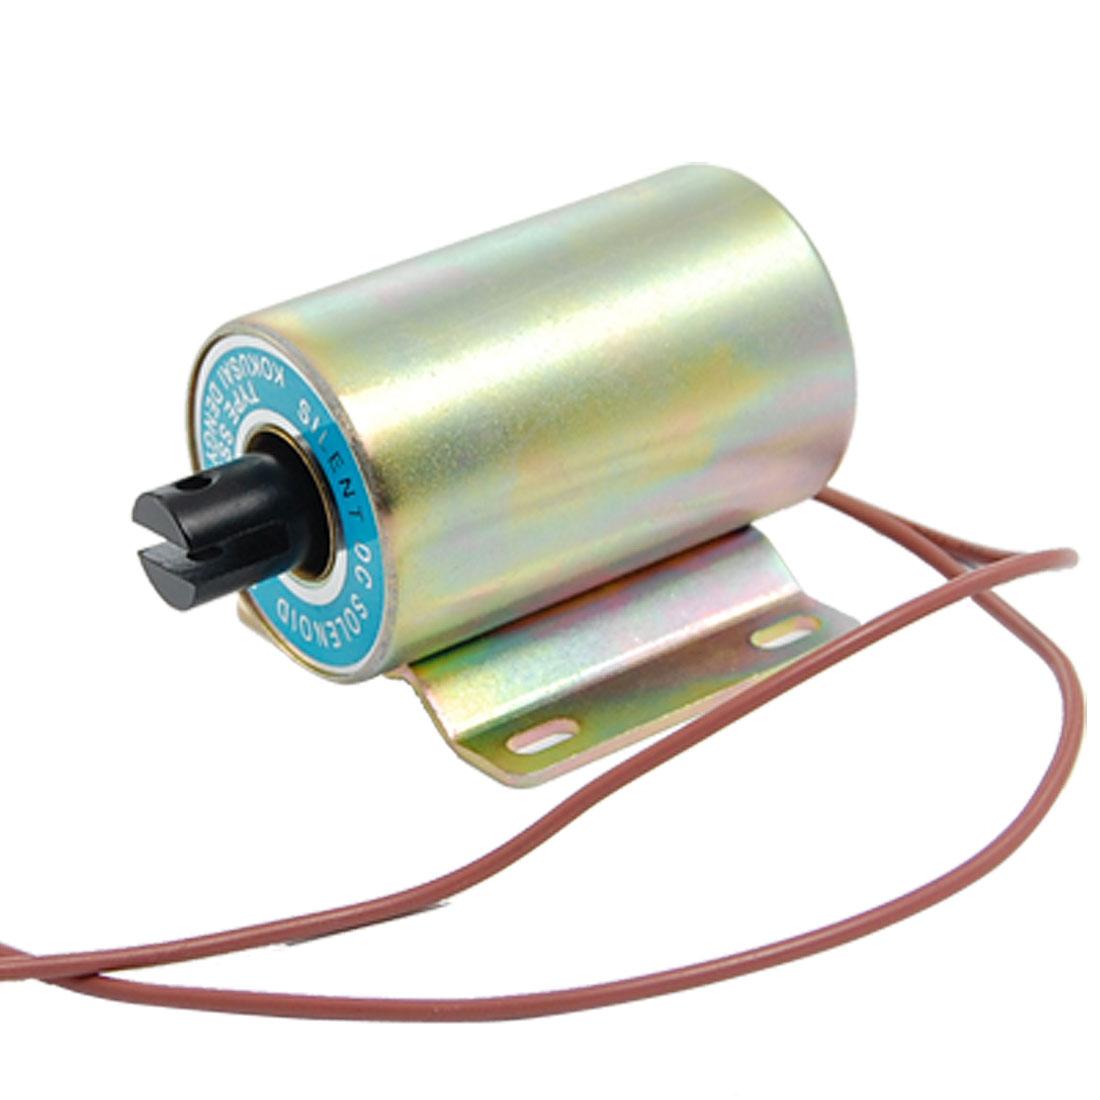 DC 220V 0.68A 0-20mm Stroke Pull Type Linear Solenoid Electromagnet